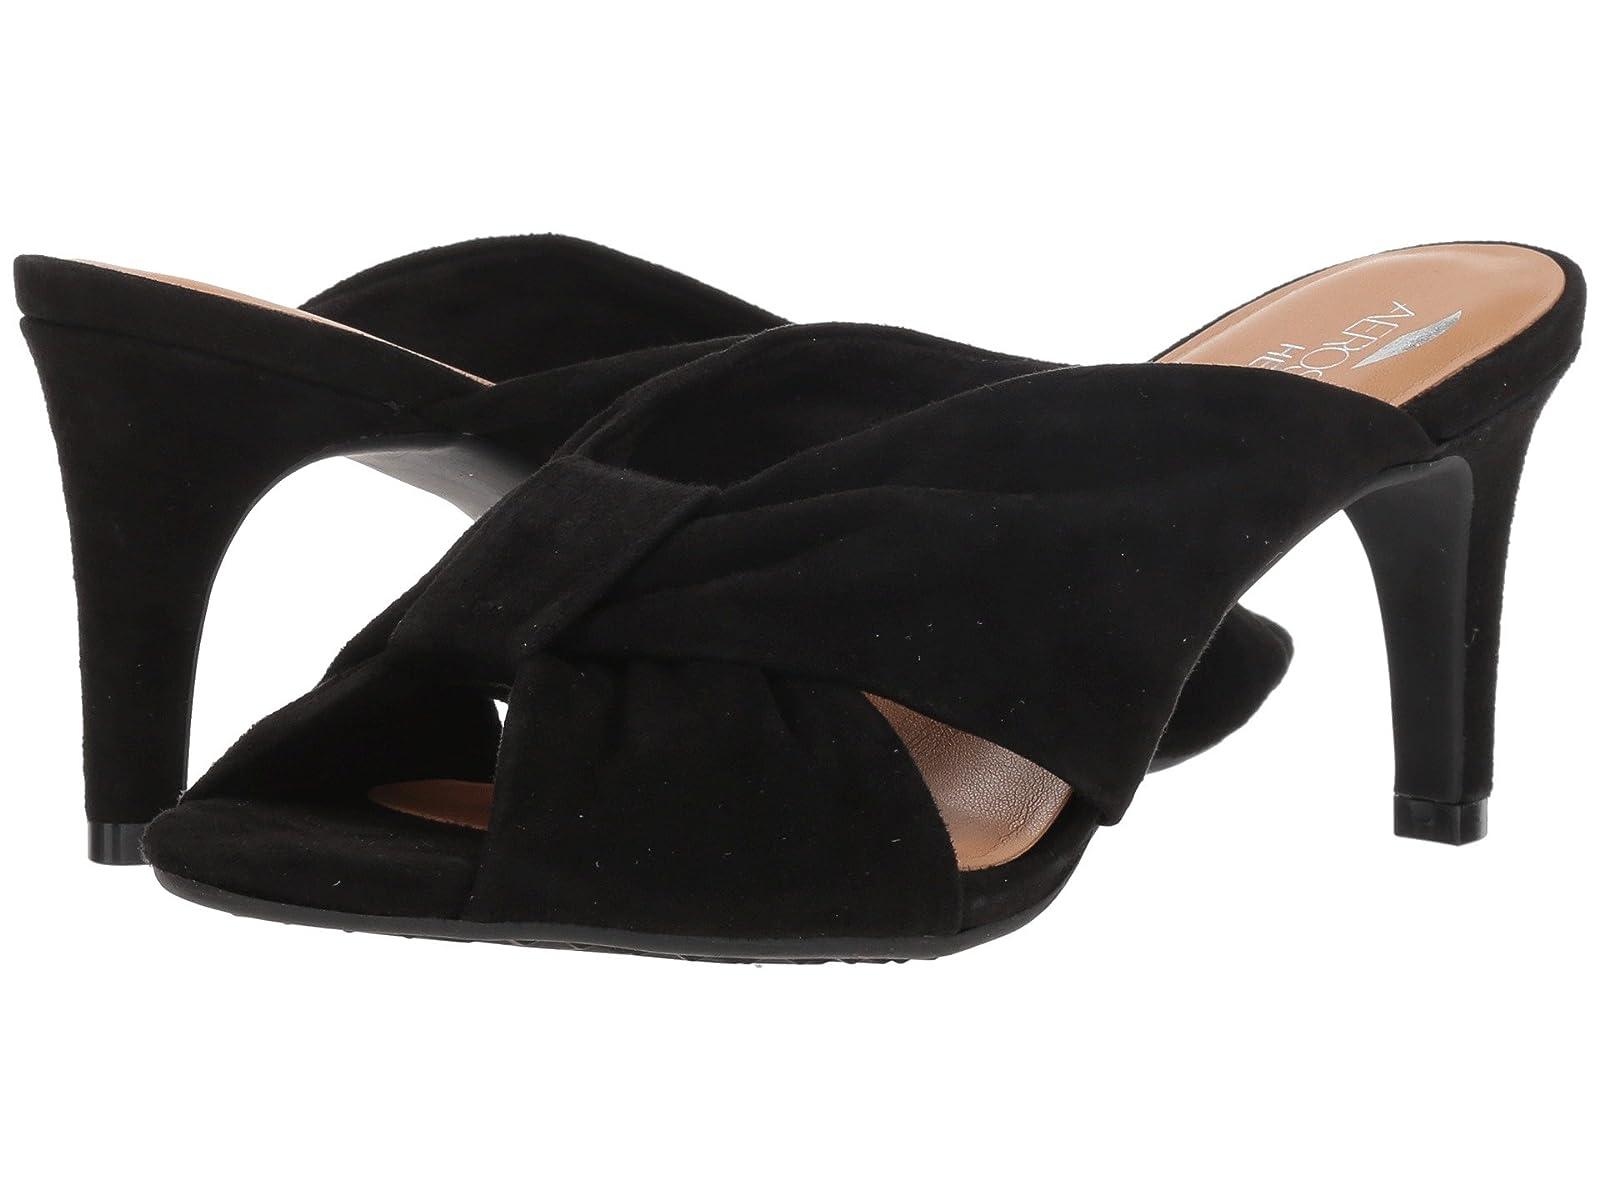 Aerosoles Street LampAtmospheric grades have affordable shoes